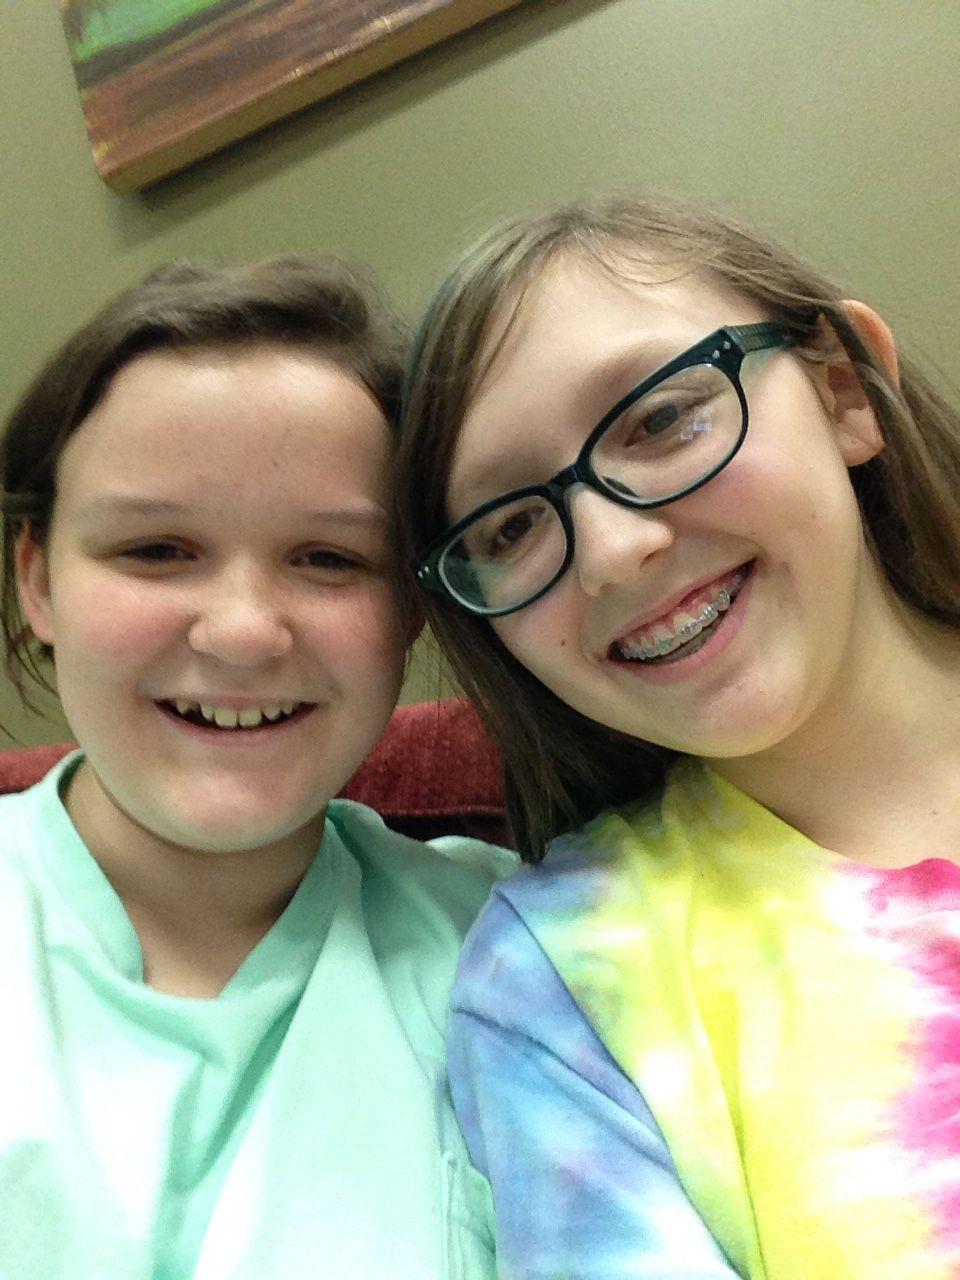 Me and my sis @chloe1258